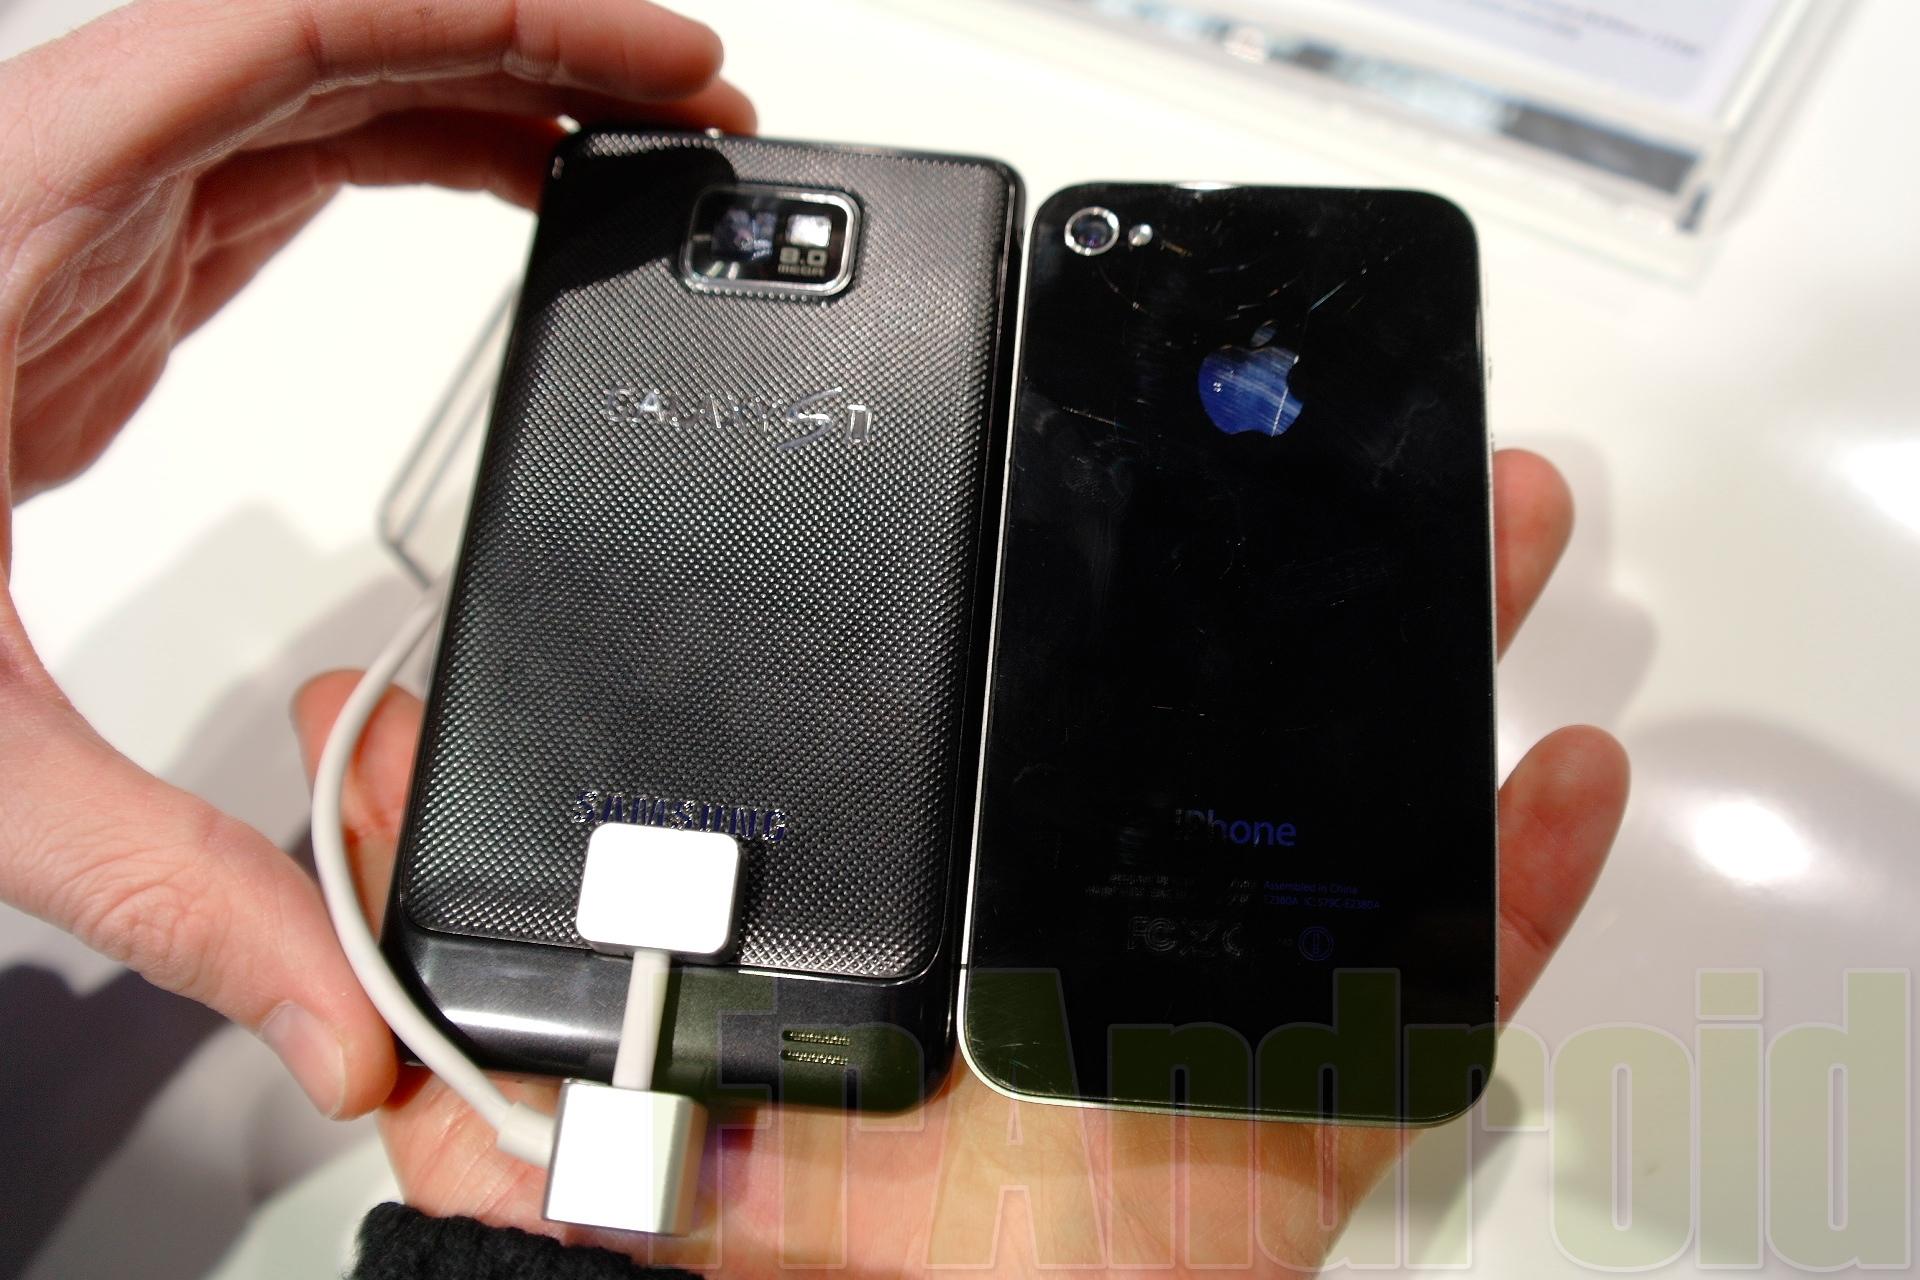 Samsung Galaxy S2 vs iPhone 4